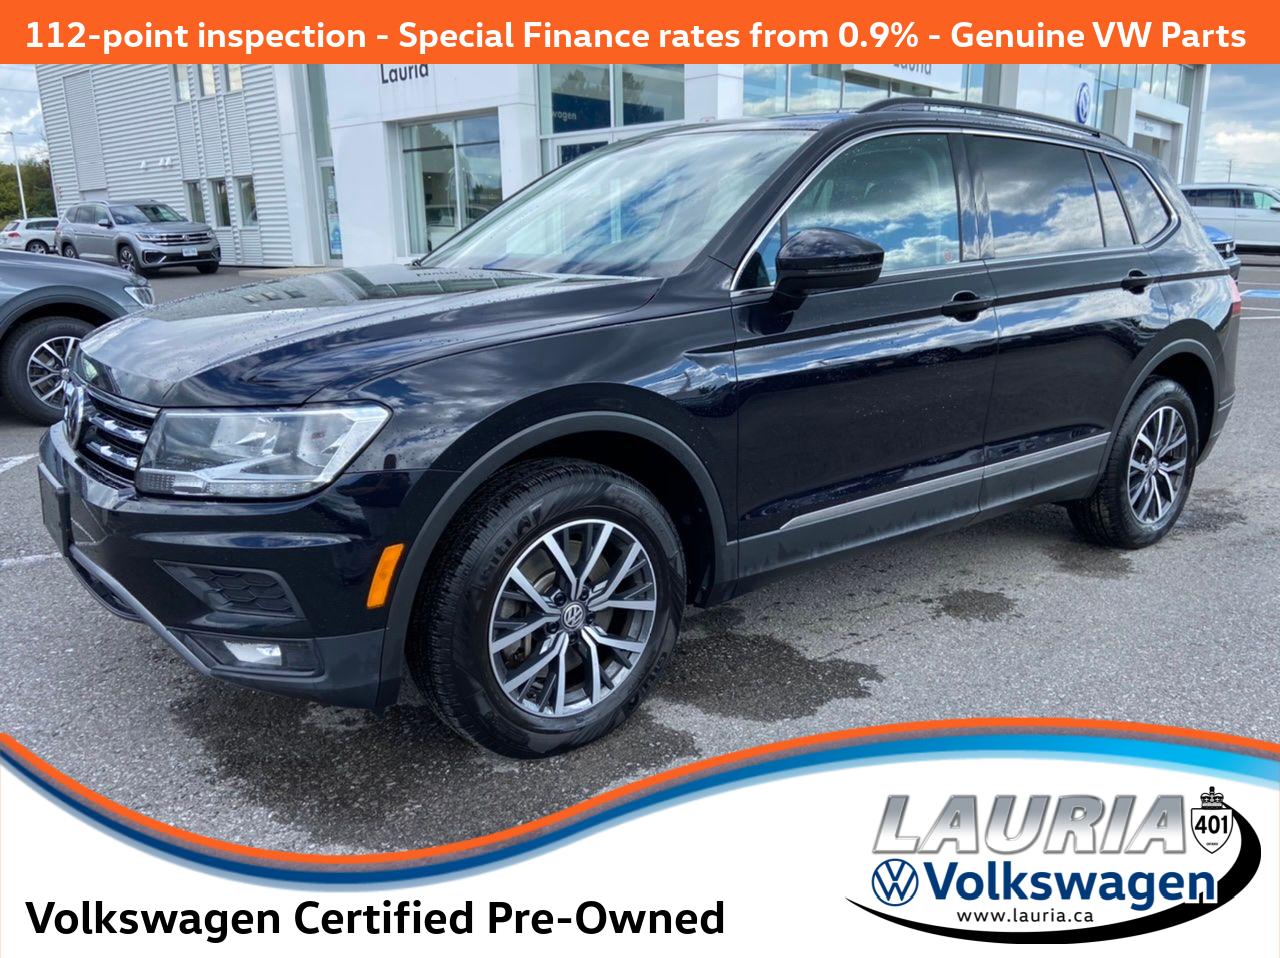 used 2019 Volkswagen Tiguan car, priced at $30,588